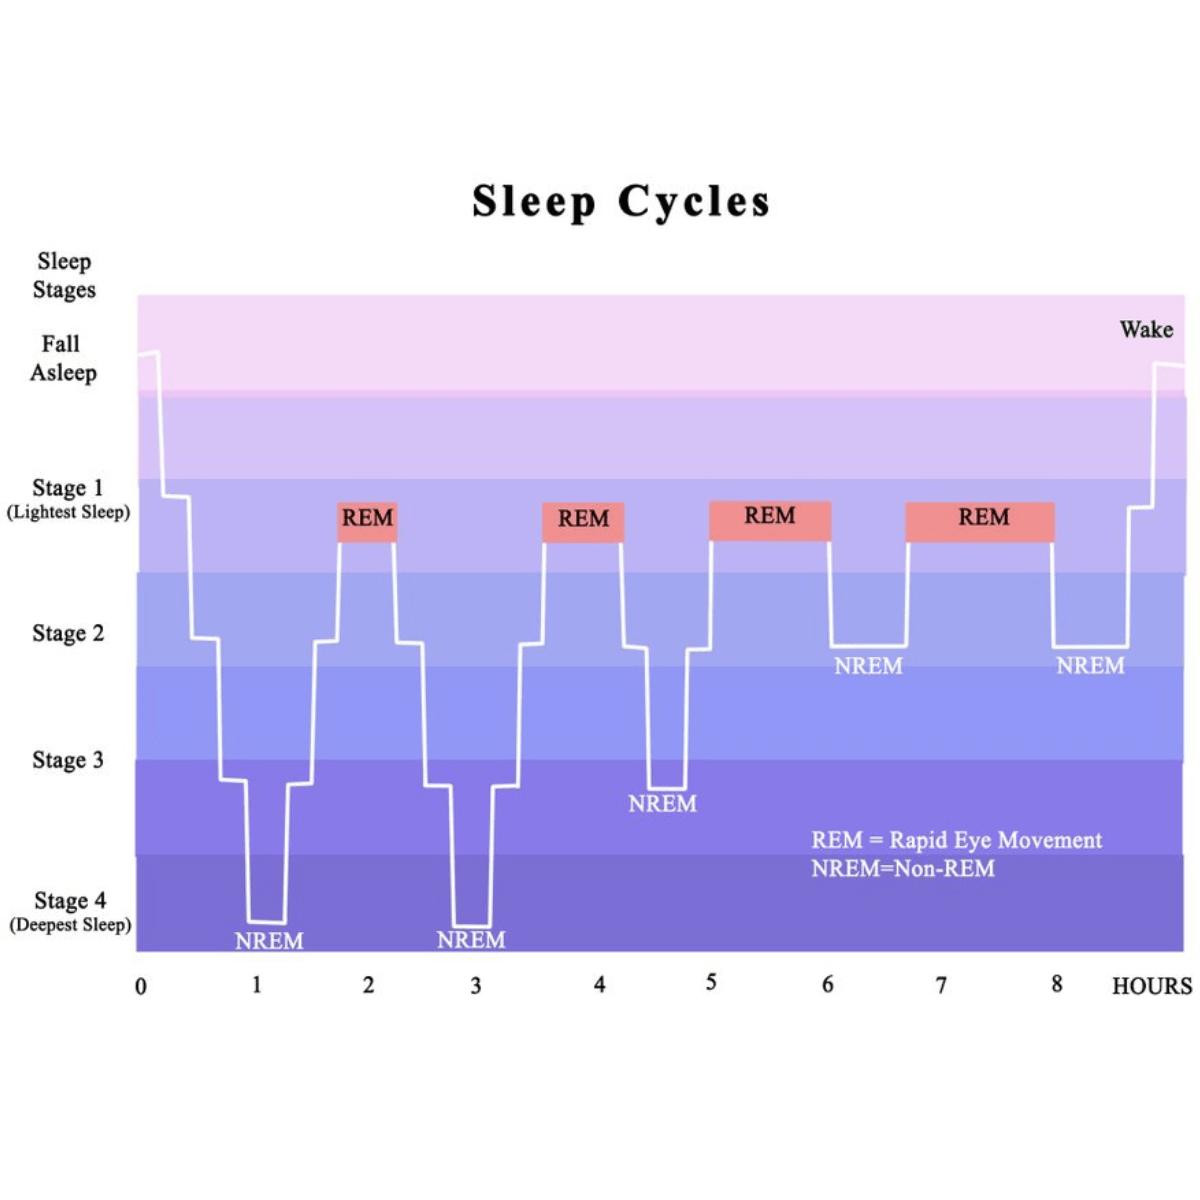 sleep cycles chart - rem sleep